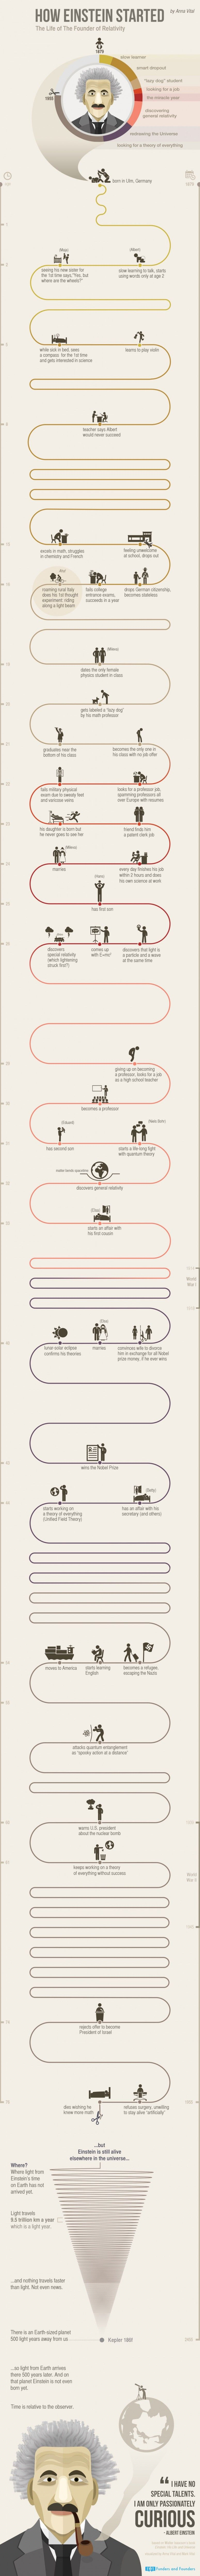 Werdegaenge Werdegang Albert Einstein T3n Digital Pioneers Einstein Grafik Lebenslauf